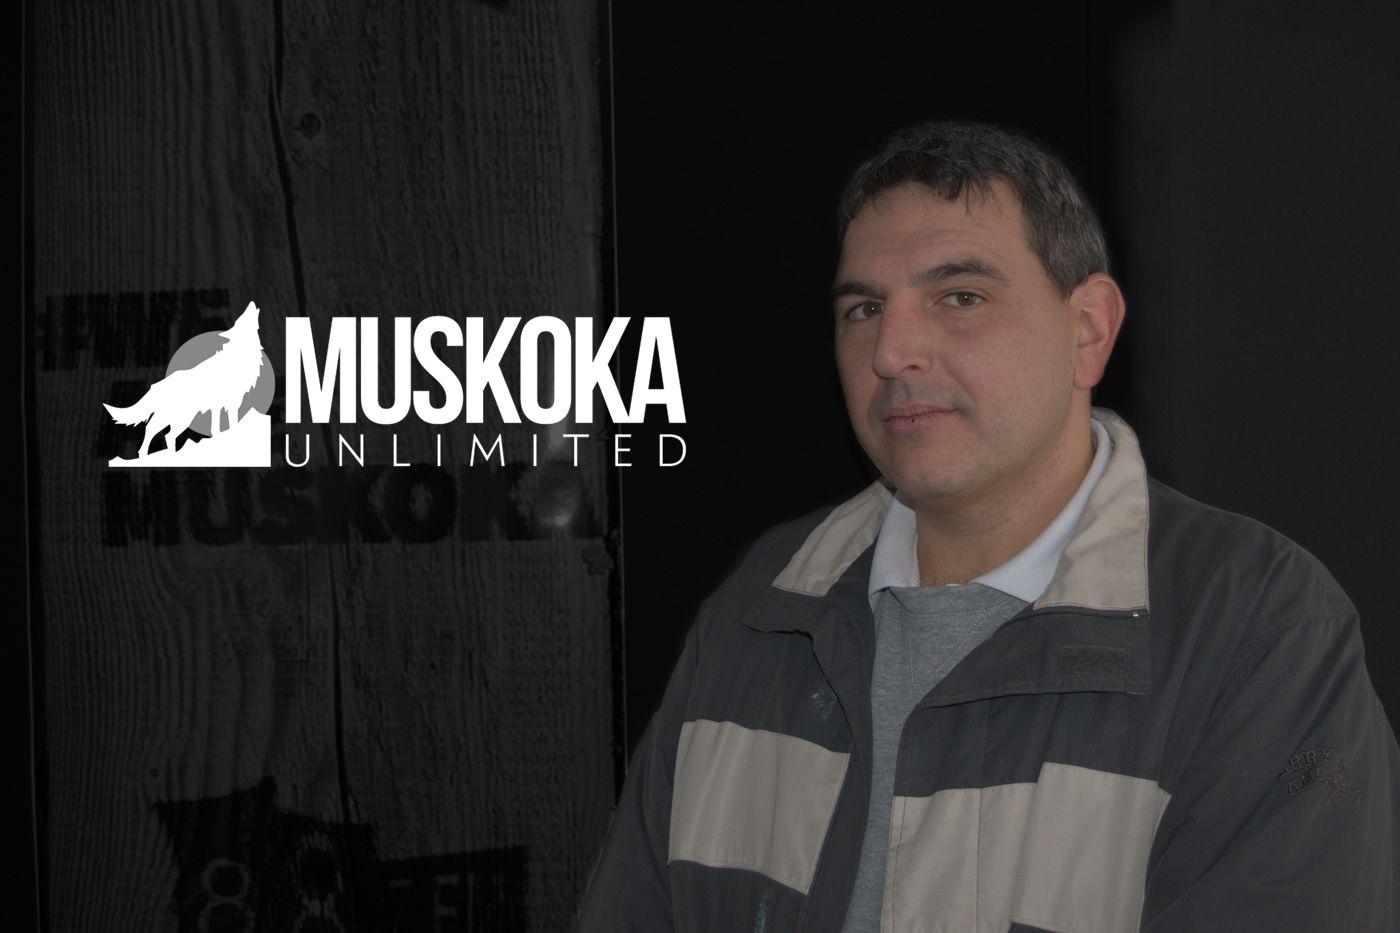 Muskoka Unlimited